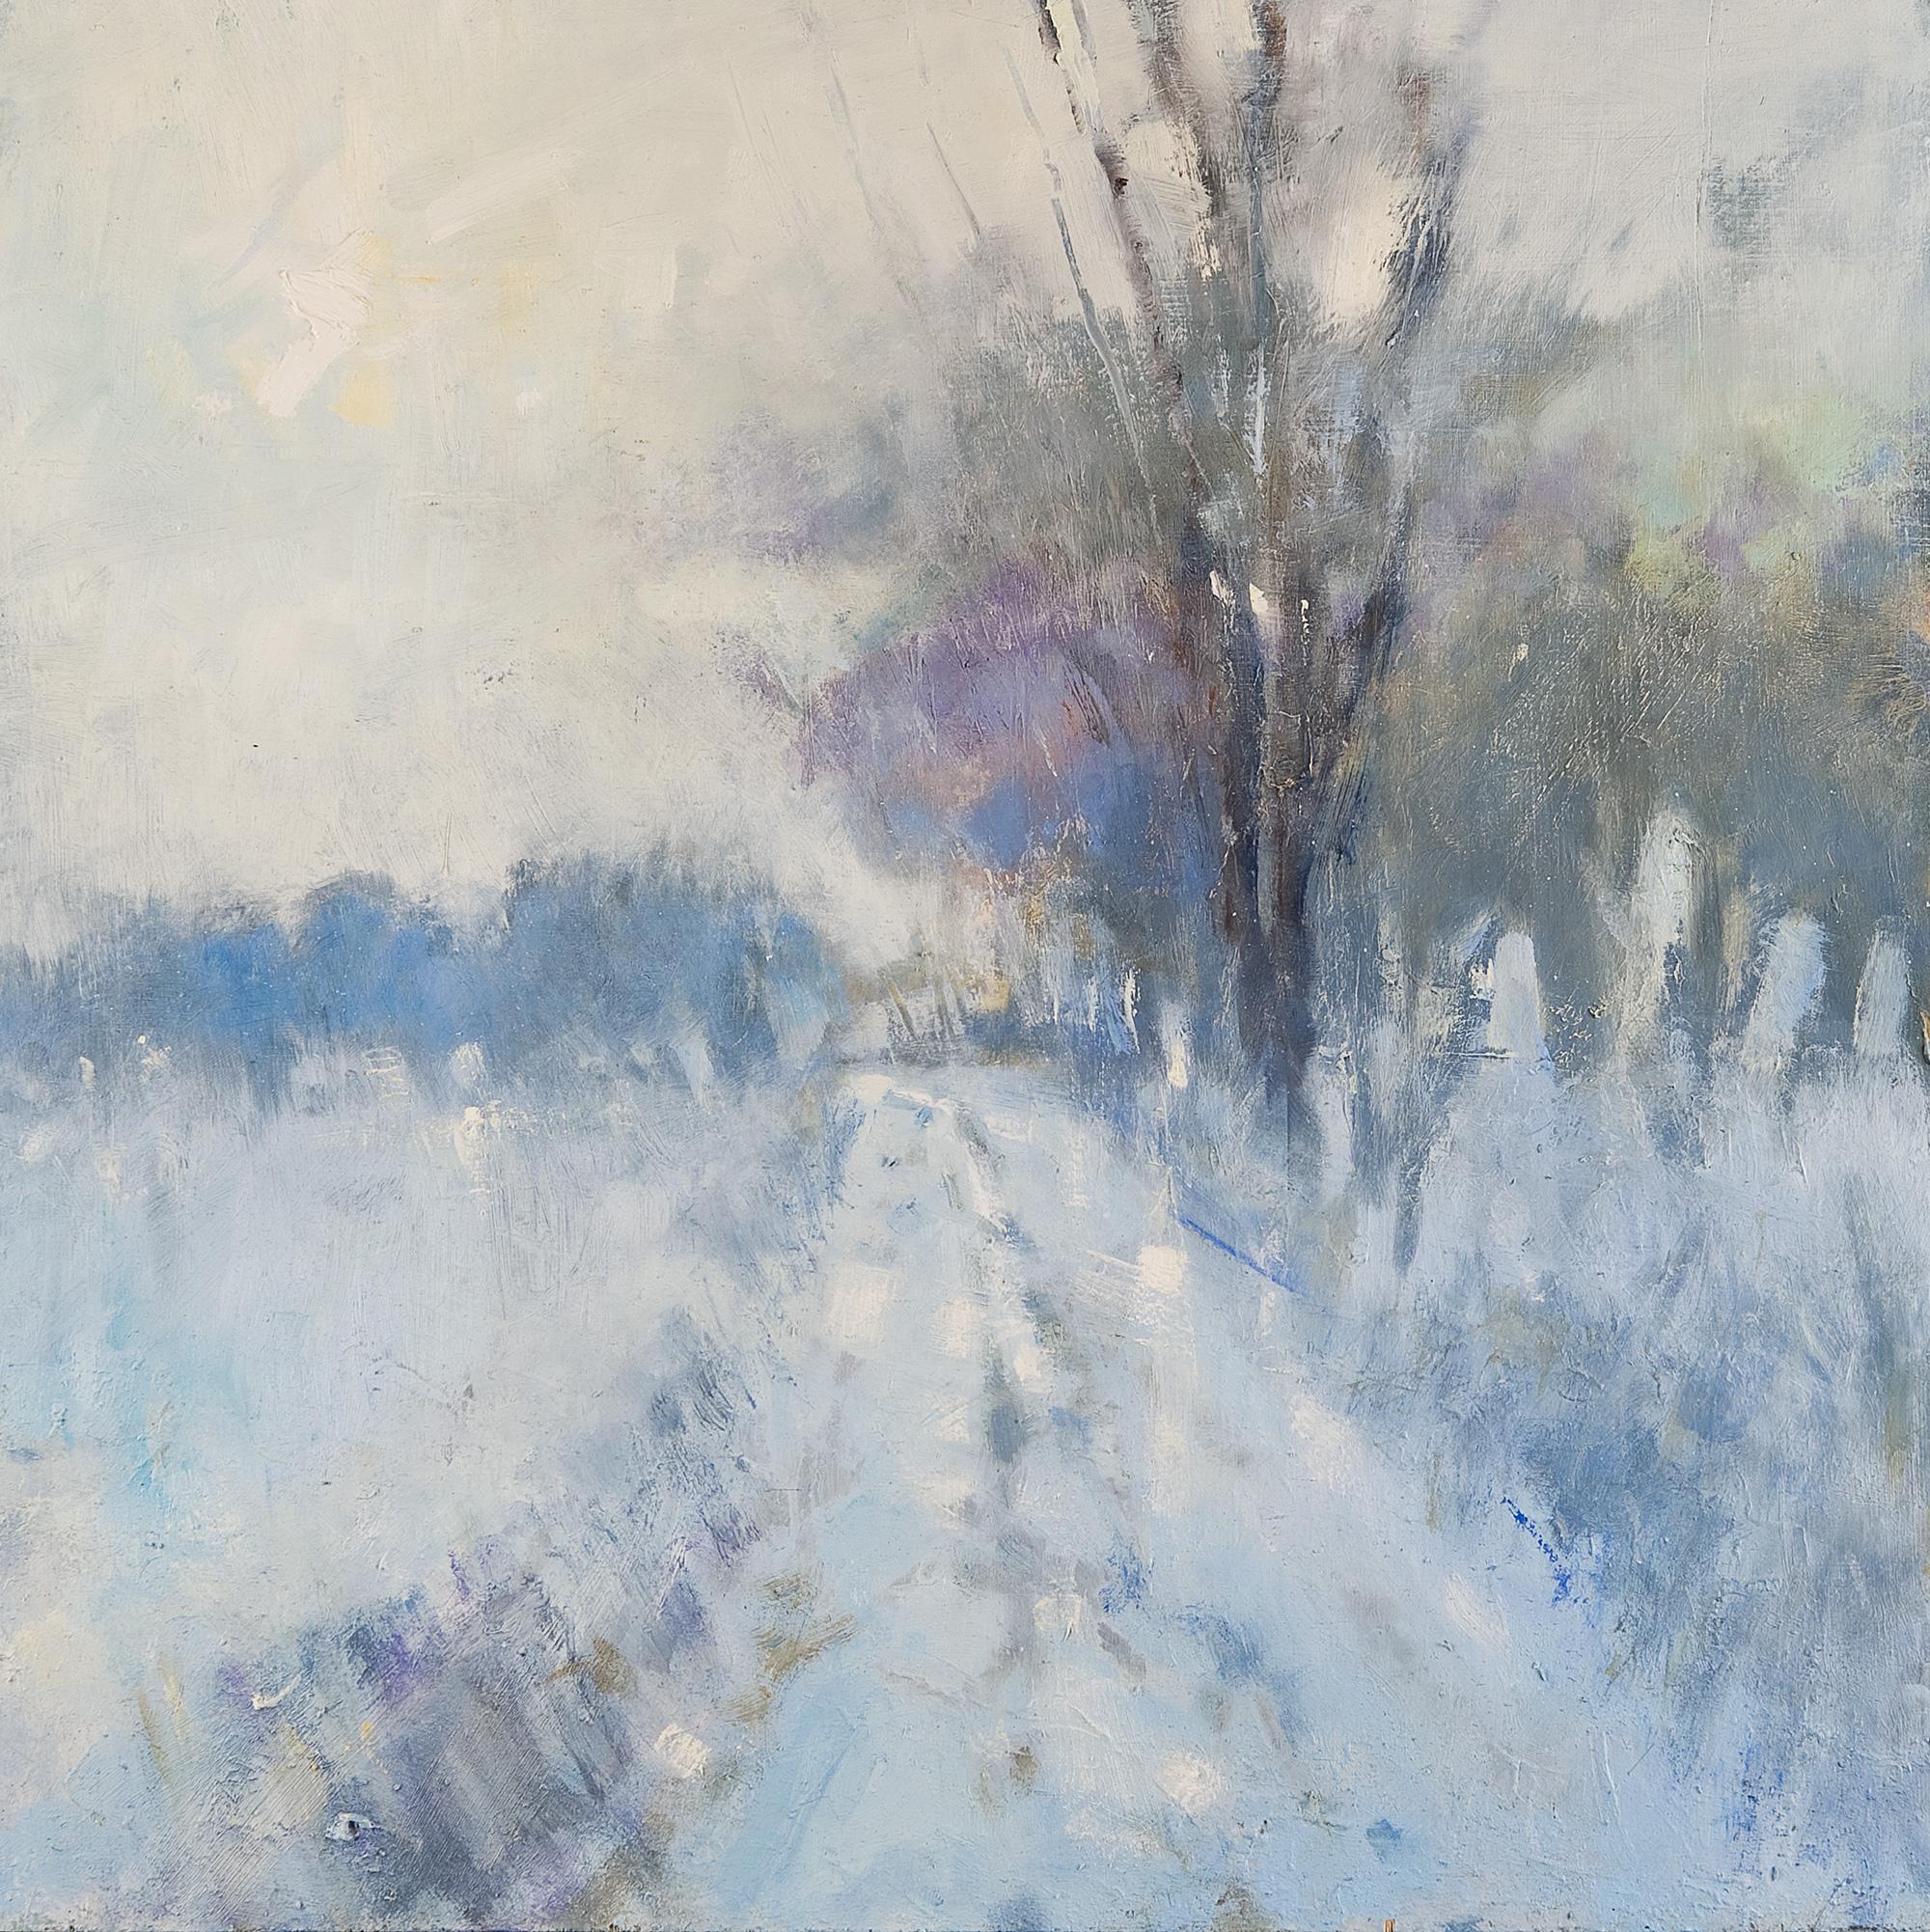 Winter Road, Broken Sunlight.  Oil on board. 61 x 61cm.  Sold